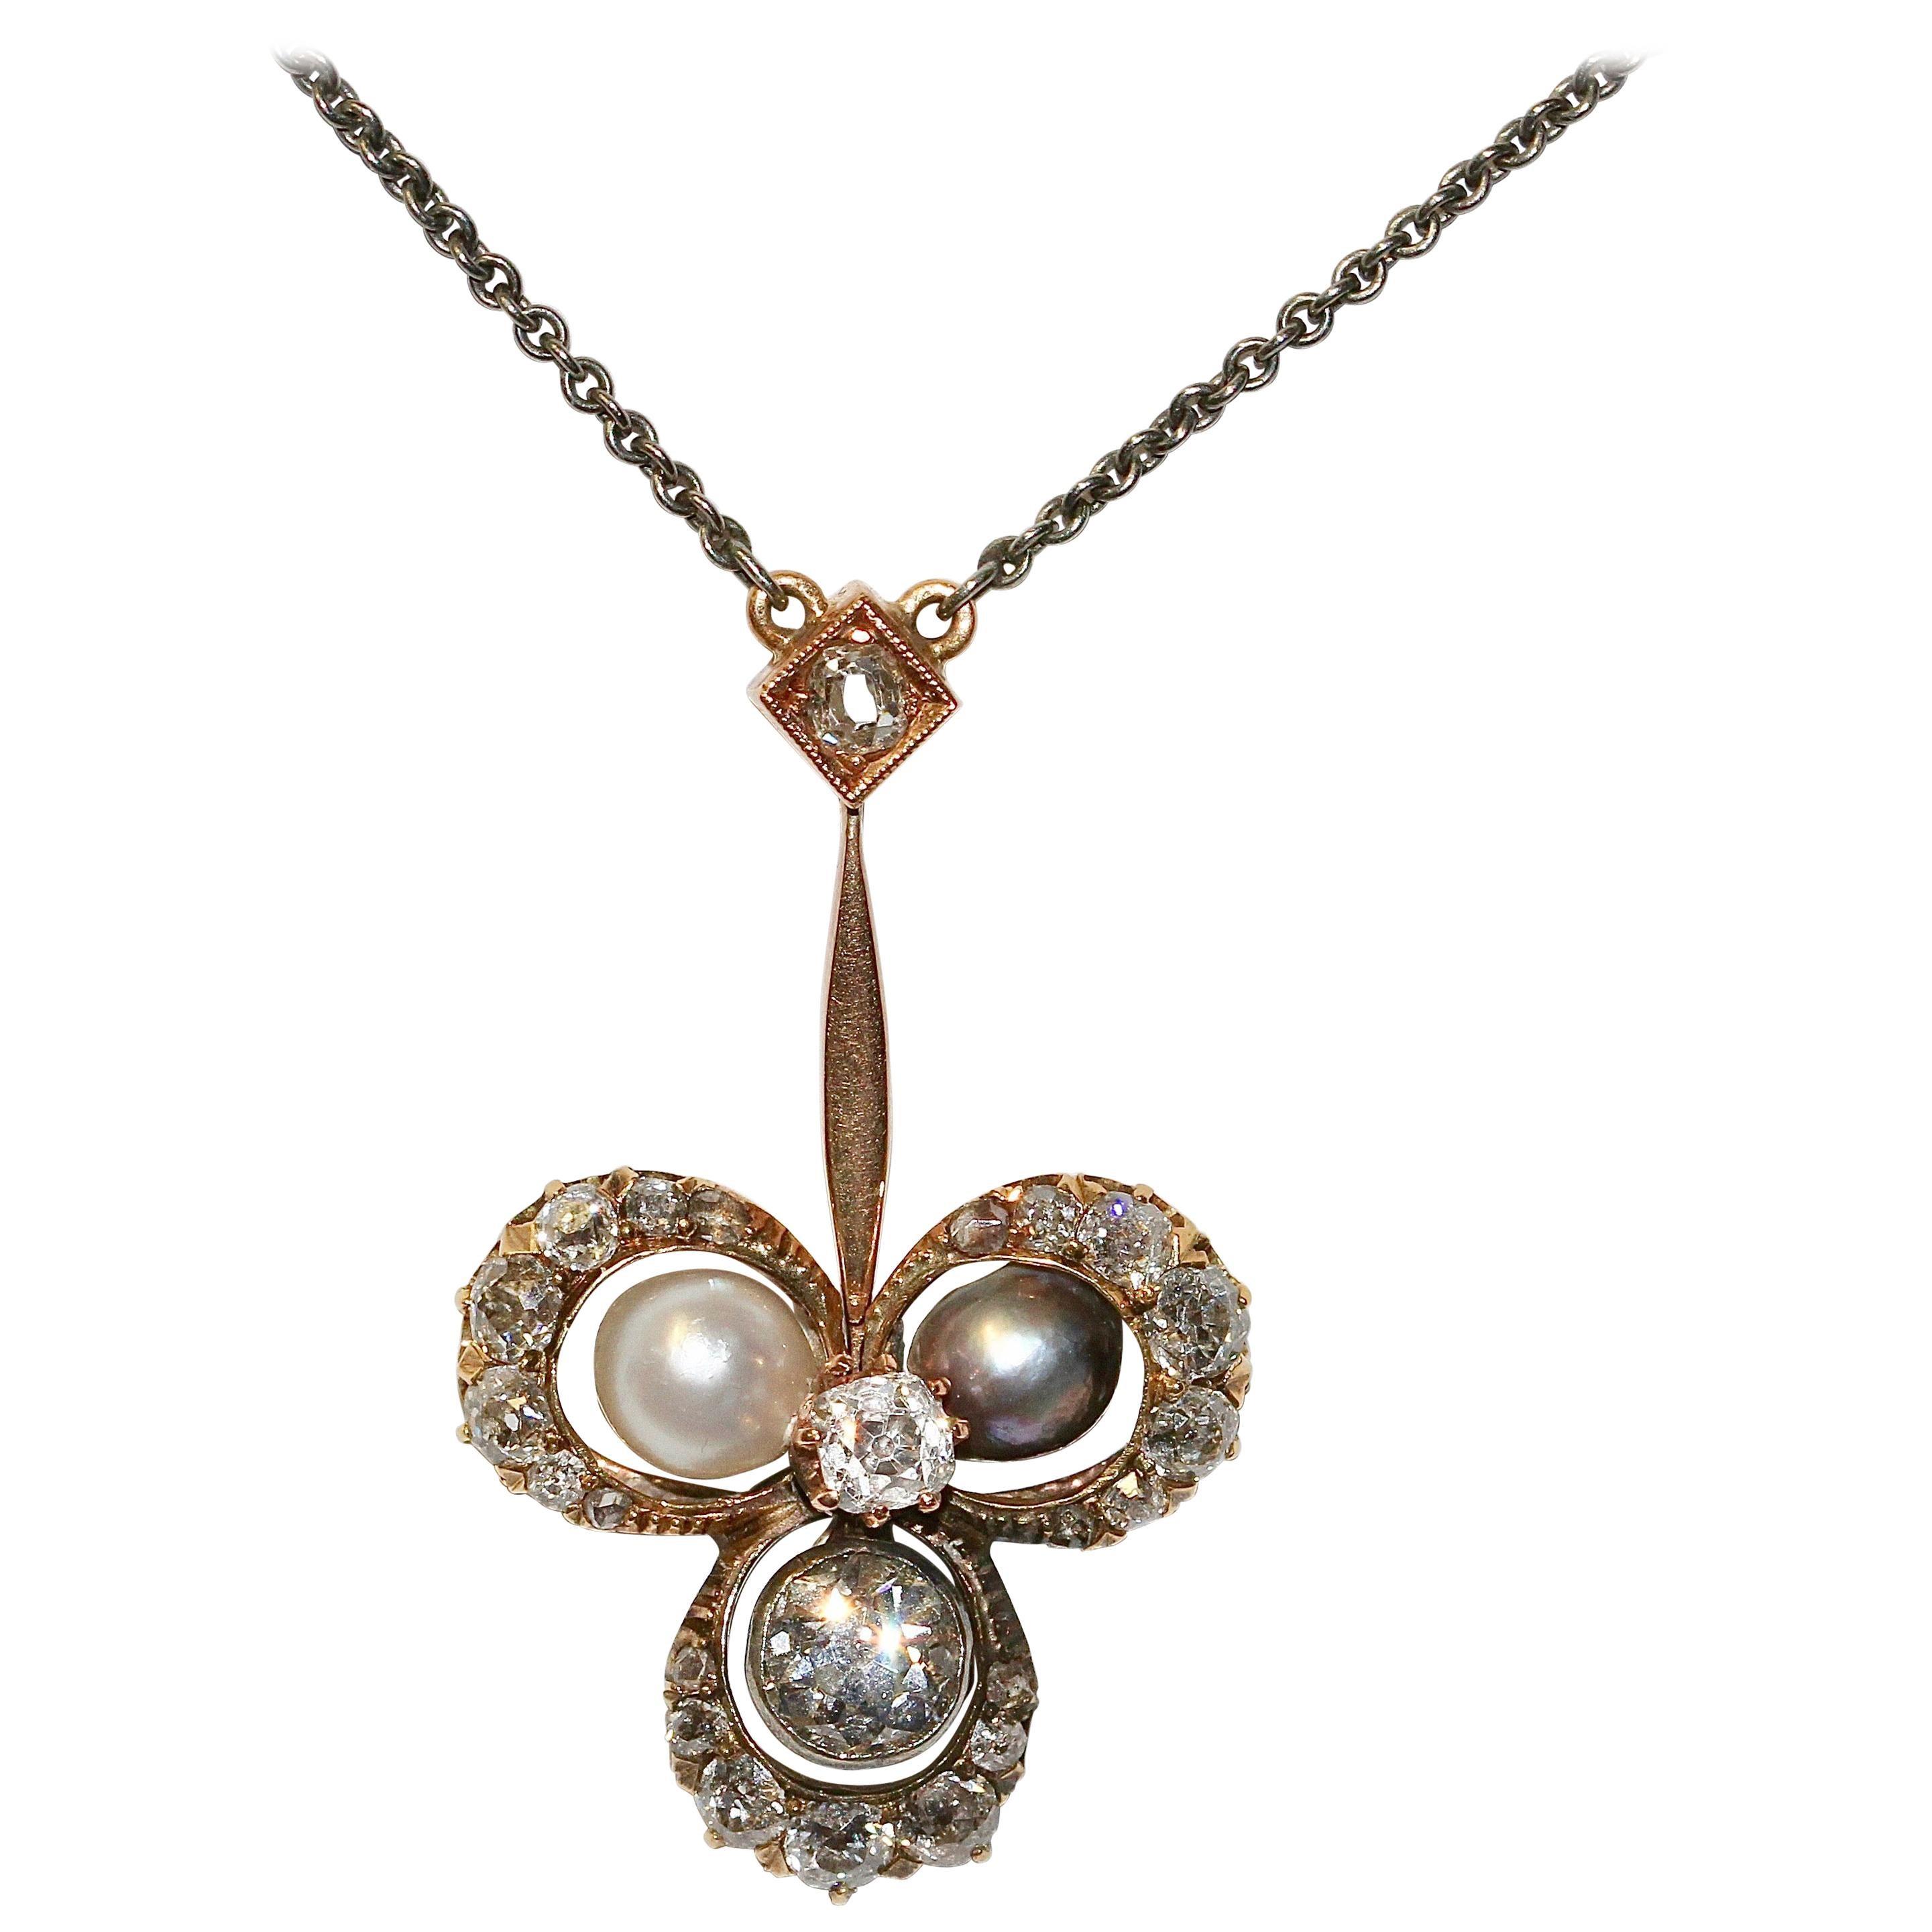 Antique Art Nouveau Gold Necklace, Pendant, with Diamonds and Natural Pearls